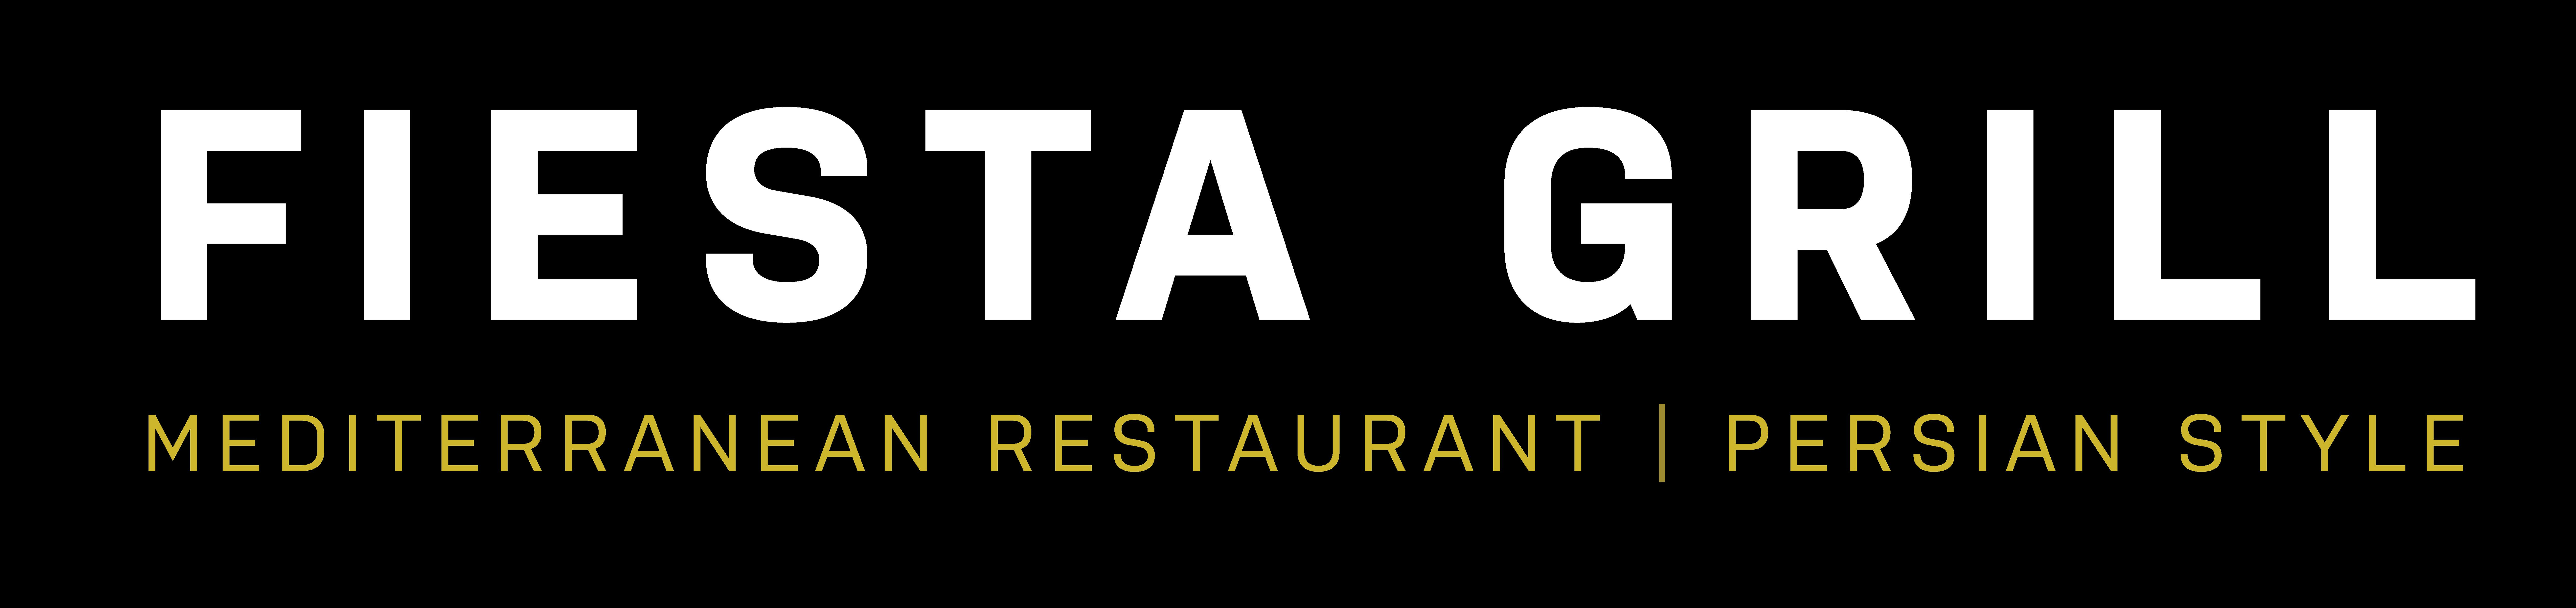 Mediterranean Restaurant | Persian Style